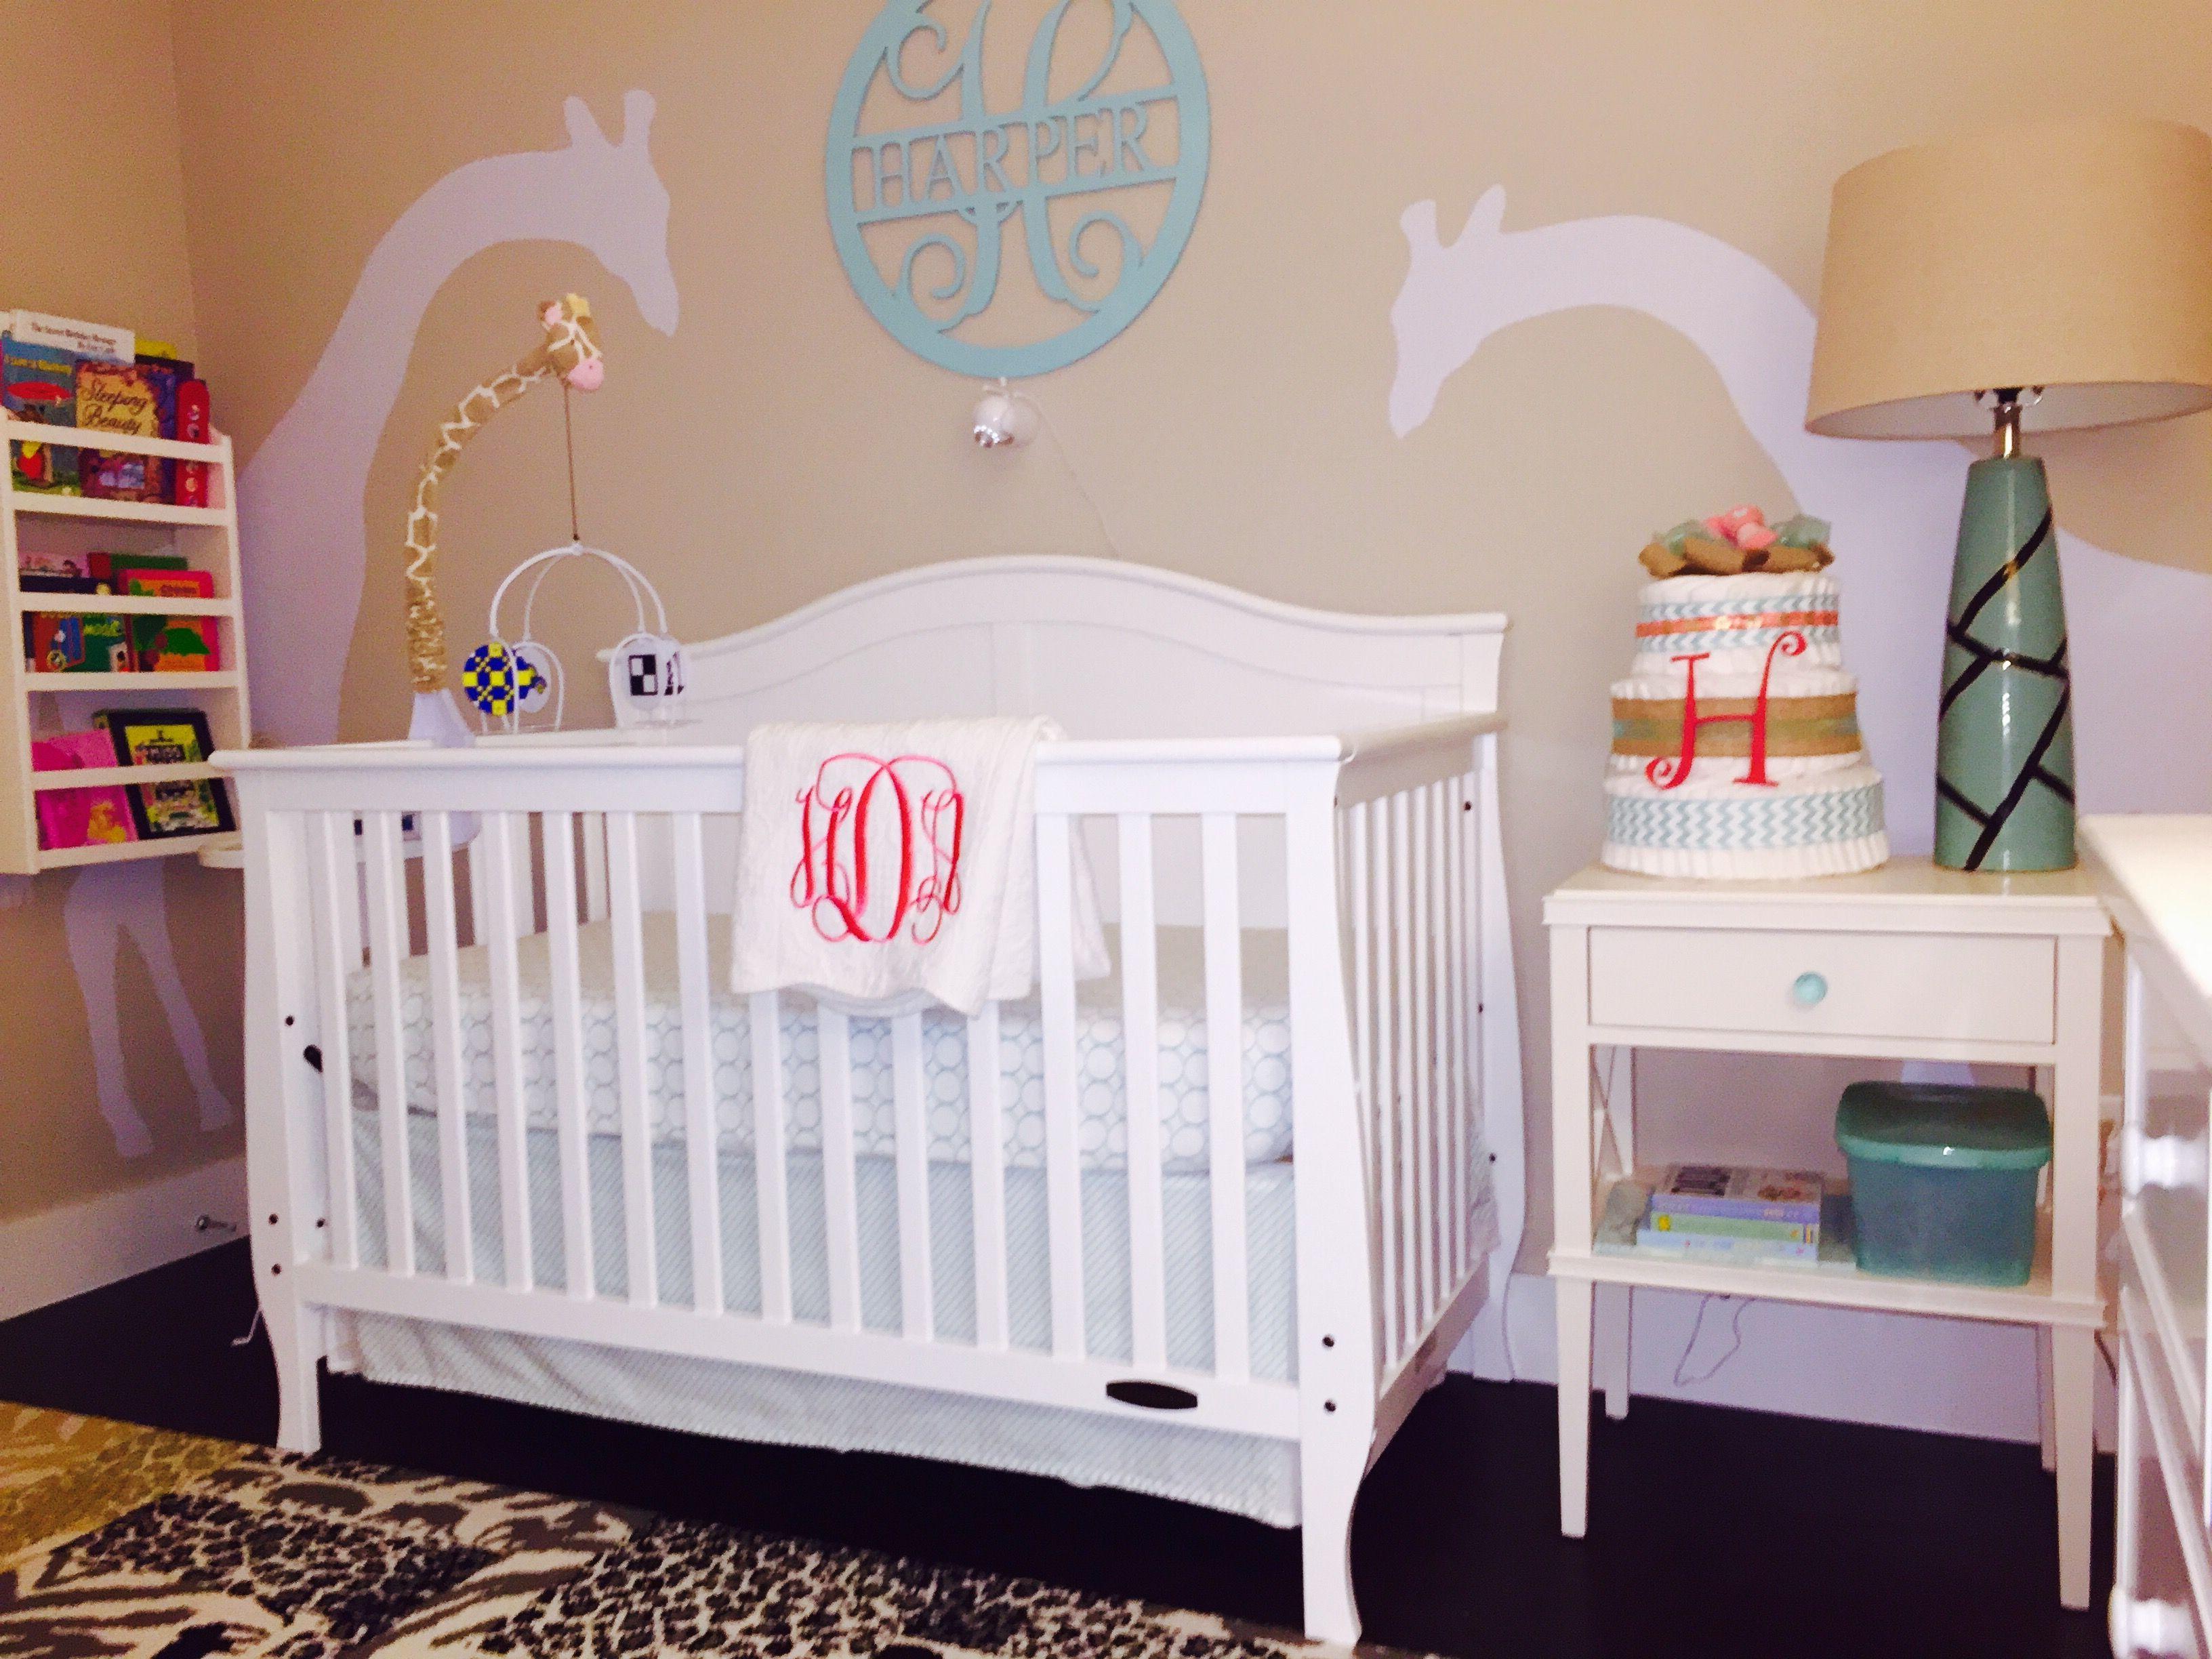 Baby nursery room, giraffe theme, furniture by Harper at